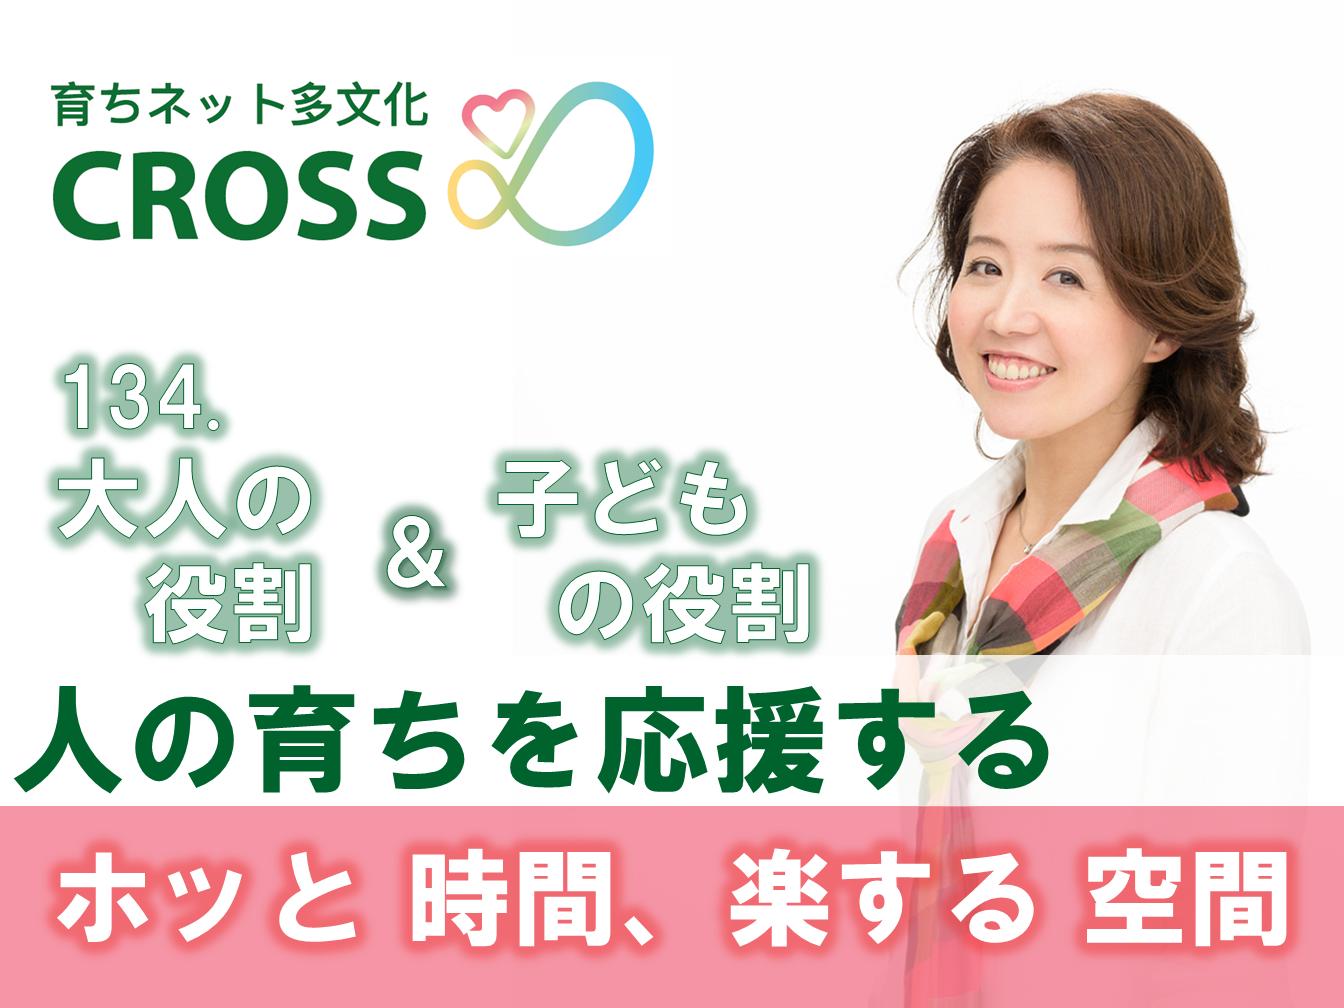 CROSS東京青山|カウンセリング&家族講座